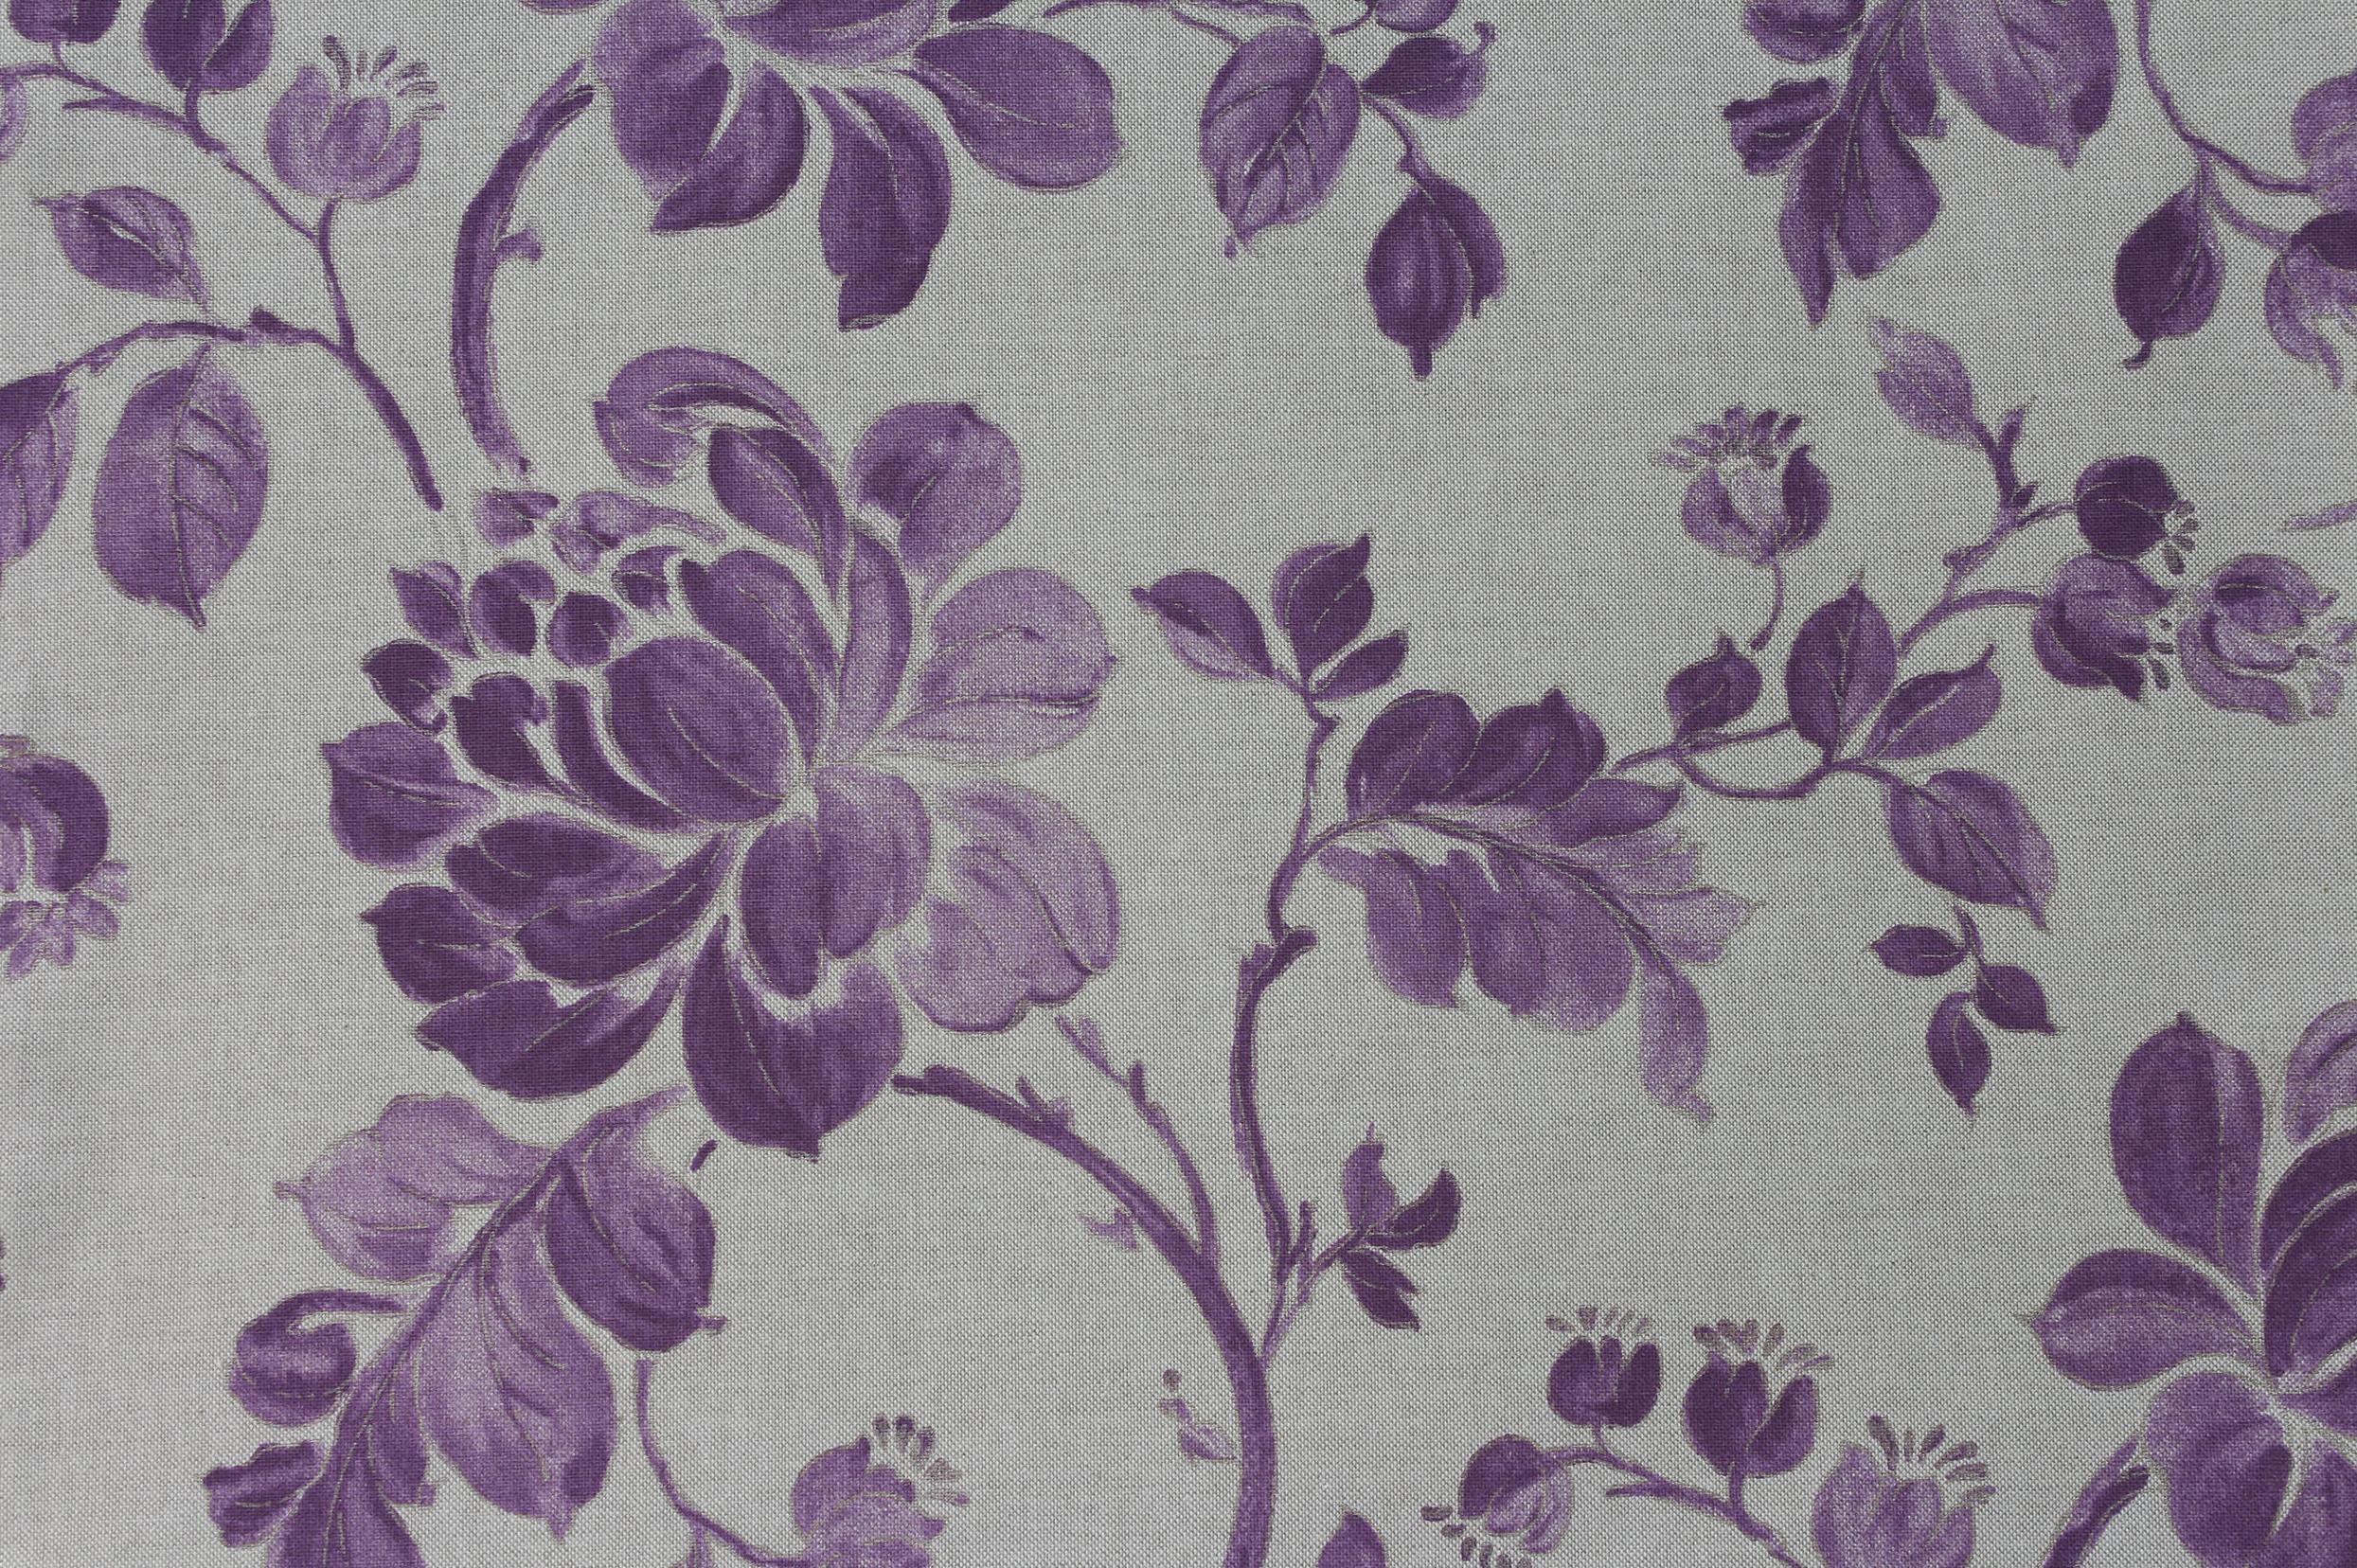 Tapizado de paredes con tejido decorado: Catálogo y Servicios de Creativa Jofrán, de Jofrán Tapicería